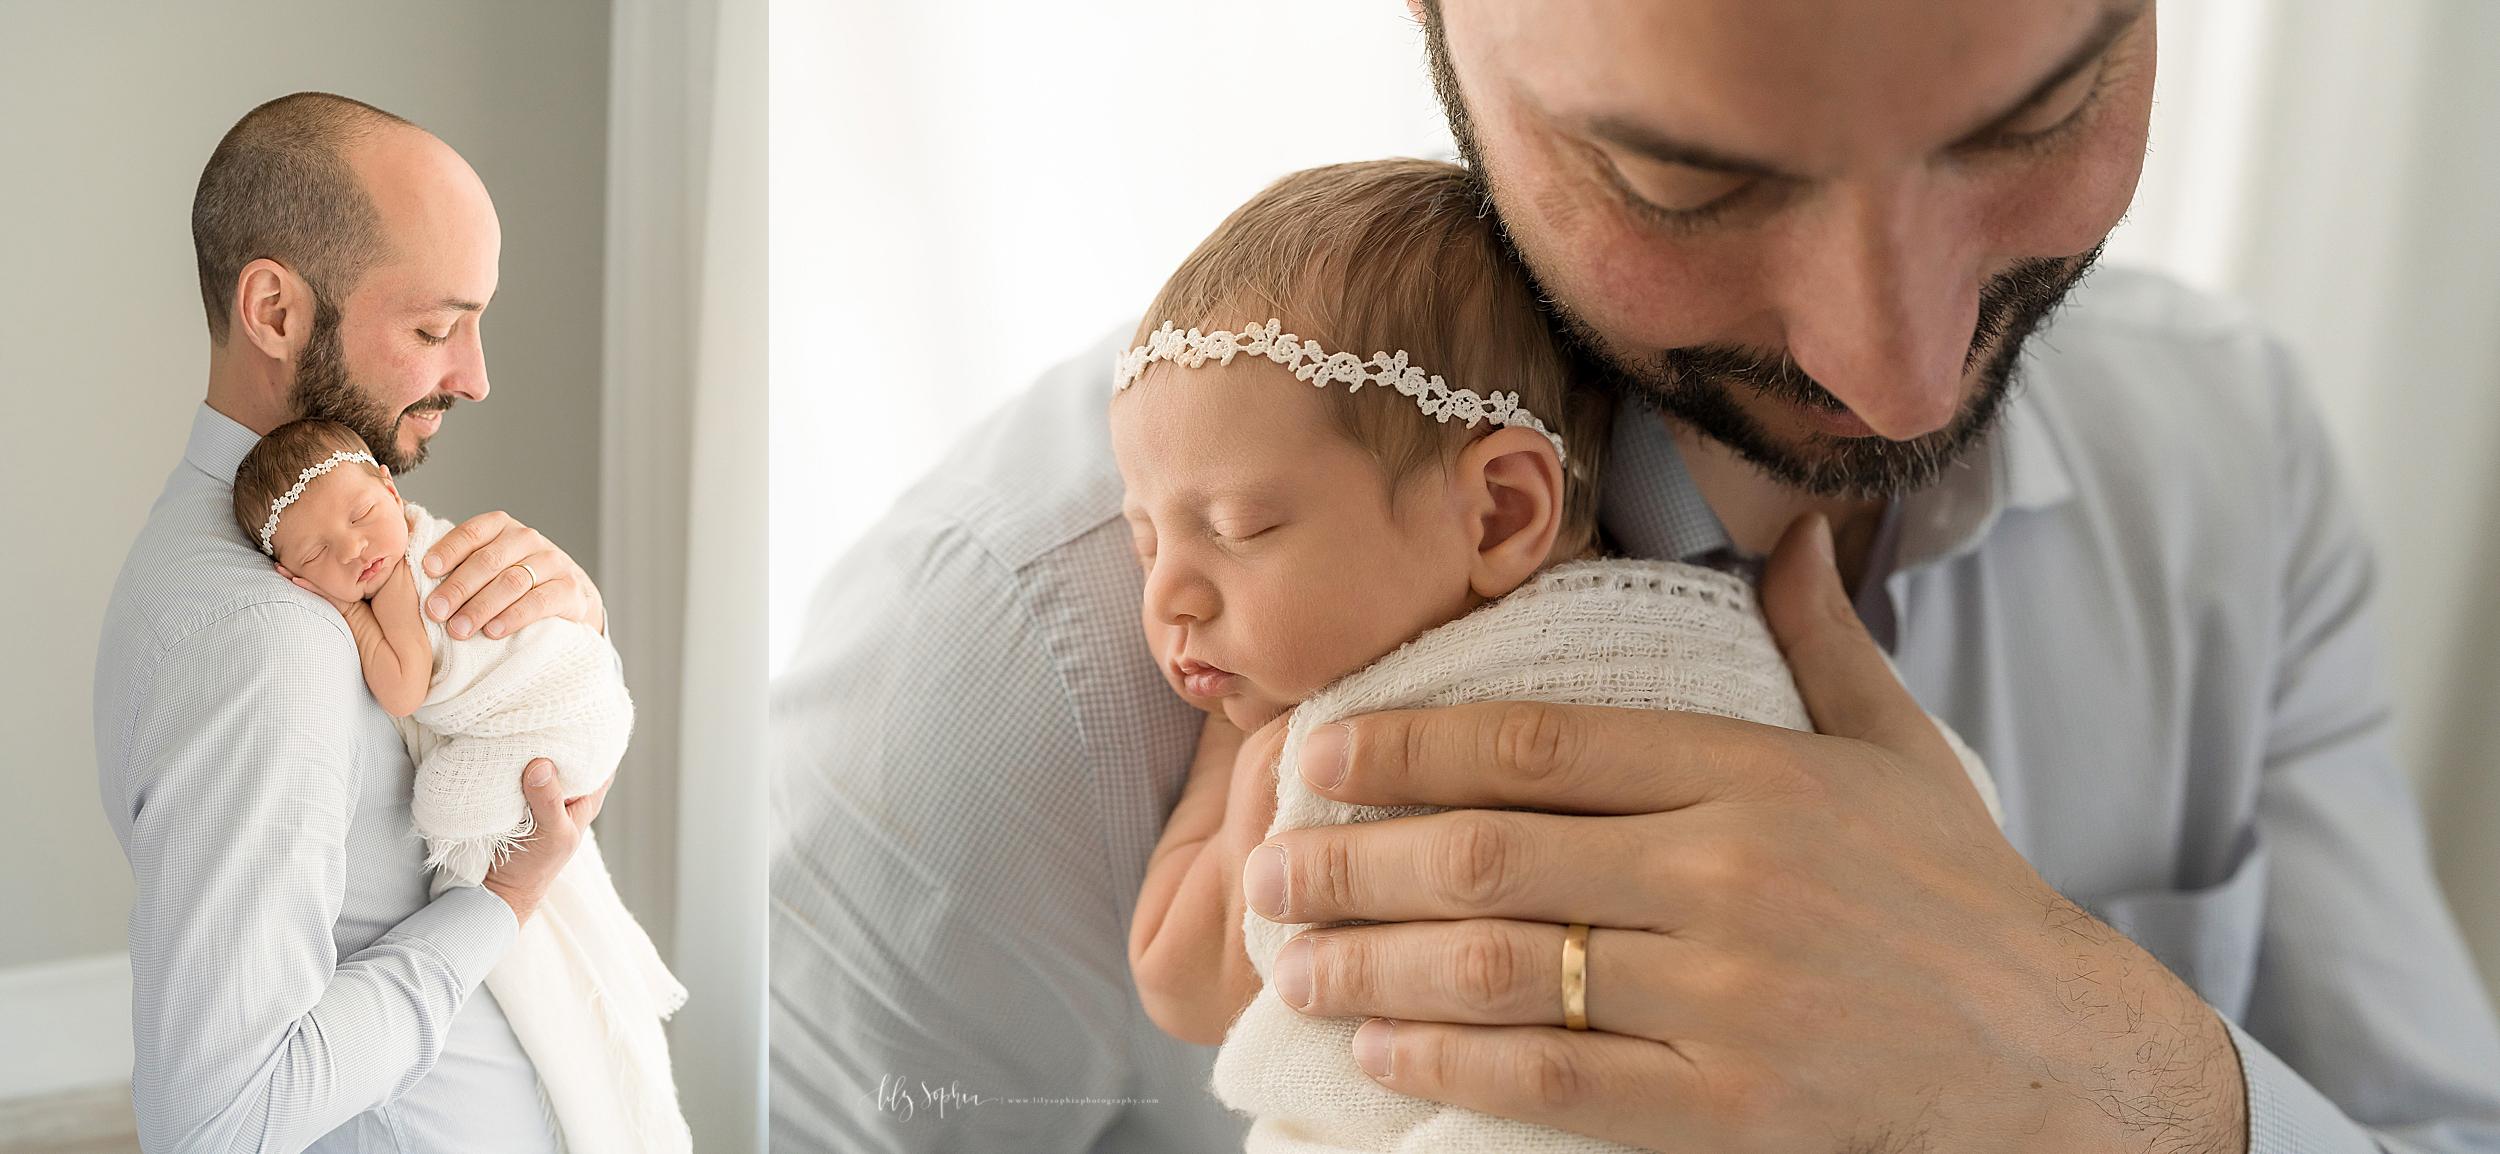 atlanta-sandy-springs-buckhead-virginia-highlands-smyrna-decatur-lily-sophia-photography-newborn-baby-girl-family-studio-portraits_0936.jpg